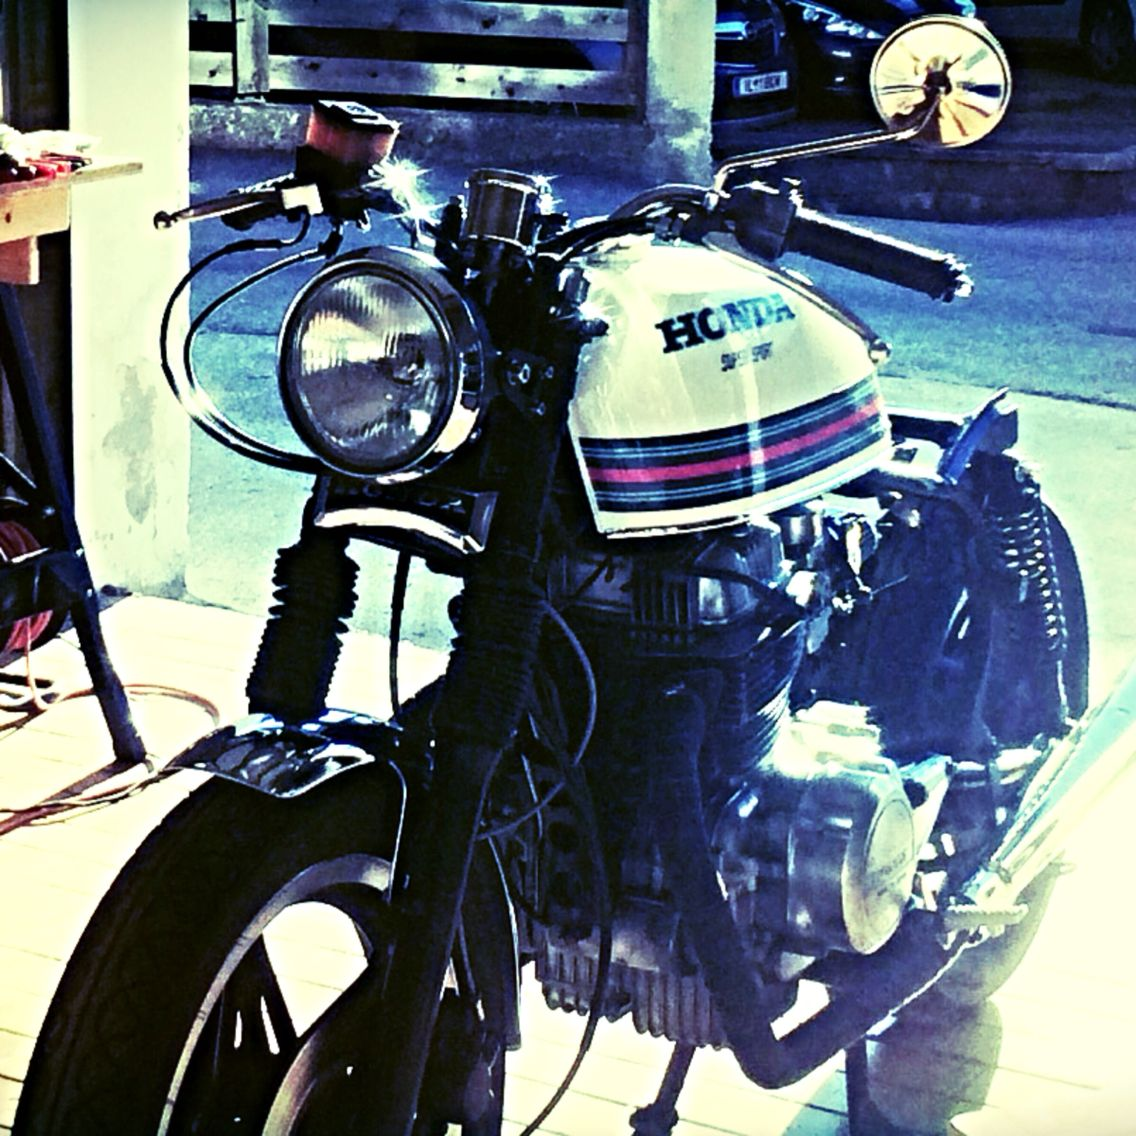 1980 Honda Cm400t Motorcycle Design Motorbikes Cafe Racer [ 1136 x 1136 Pixel ]